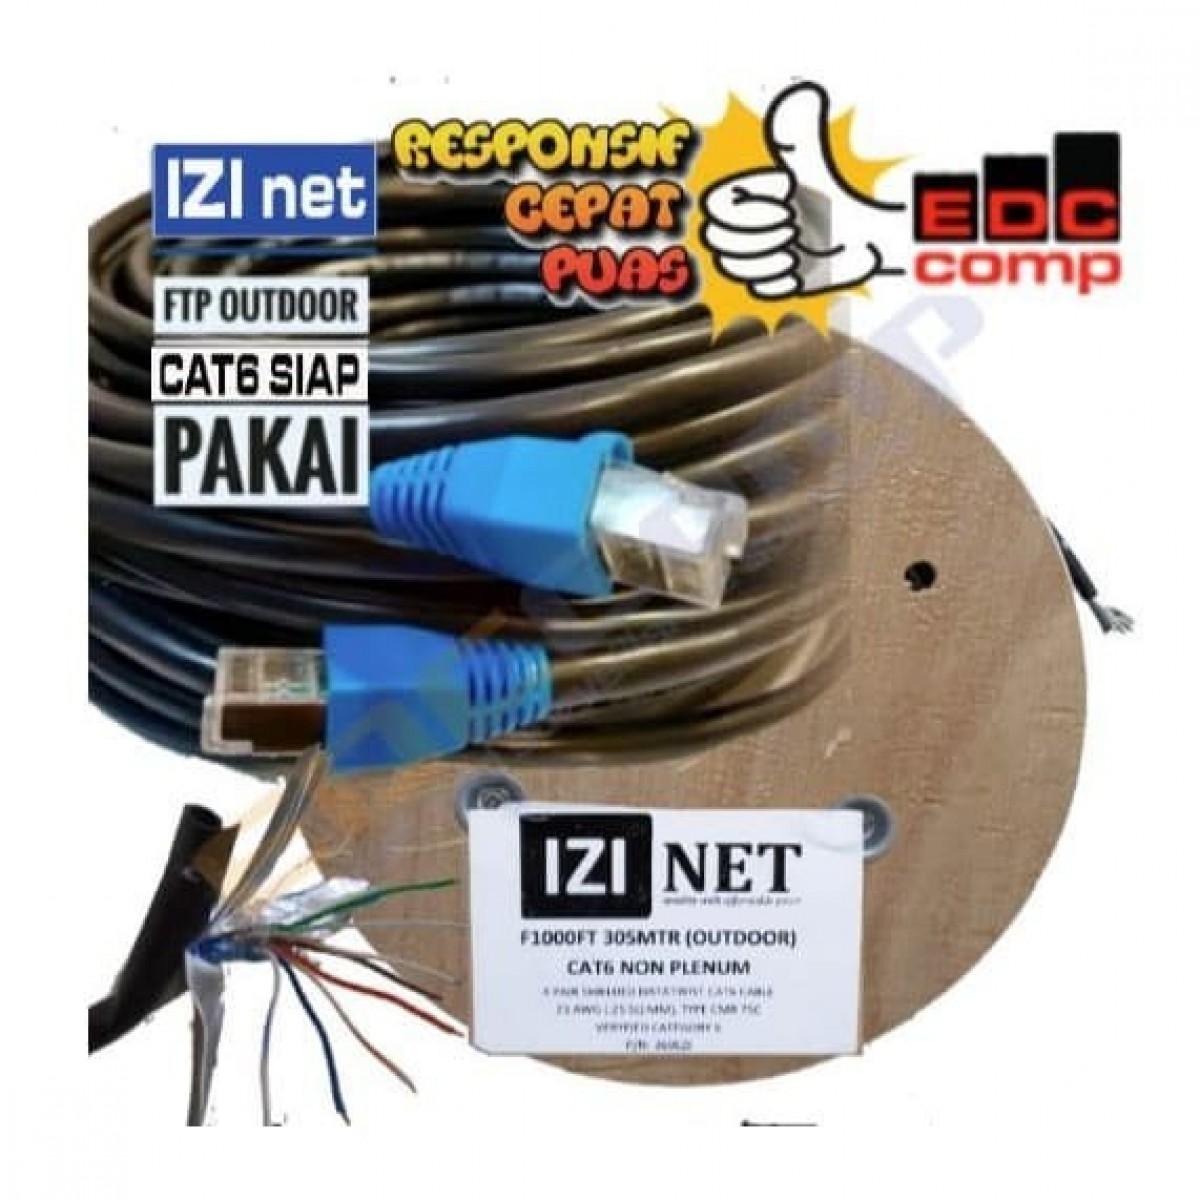 Cable STP/FTP Cat 6 Outdoor Cable 95 Meter IZI net Original - EdcComp